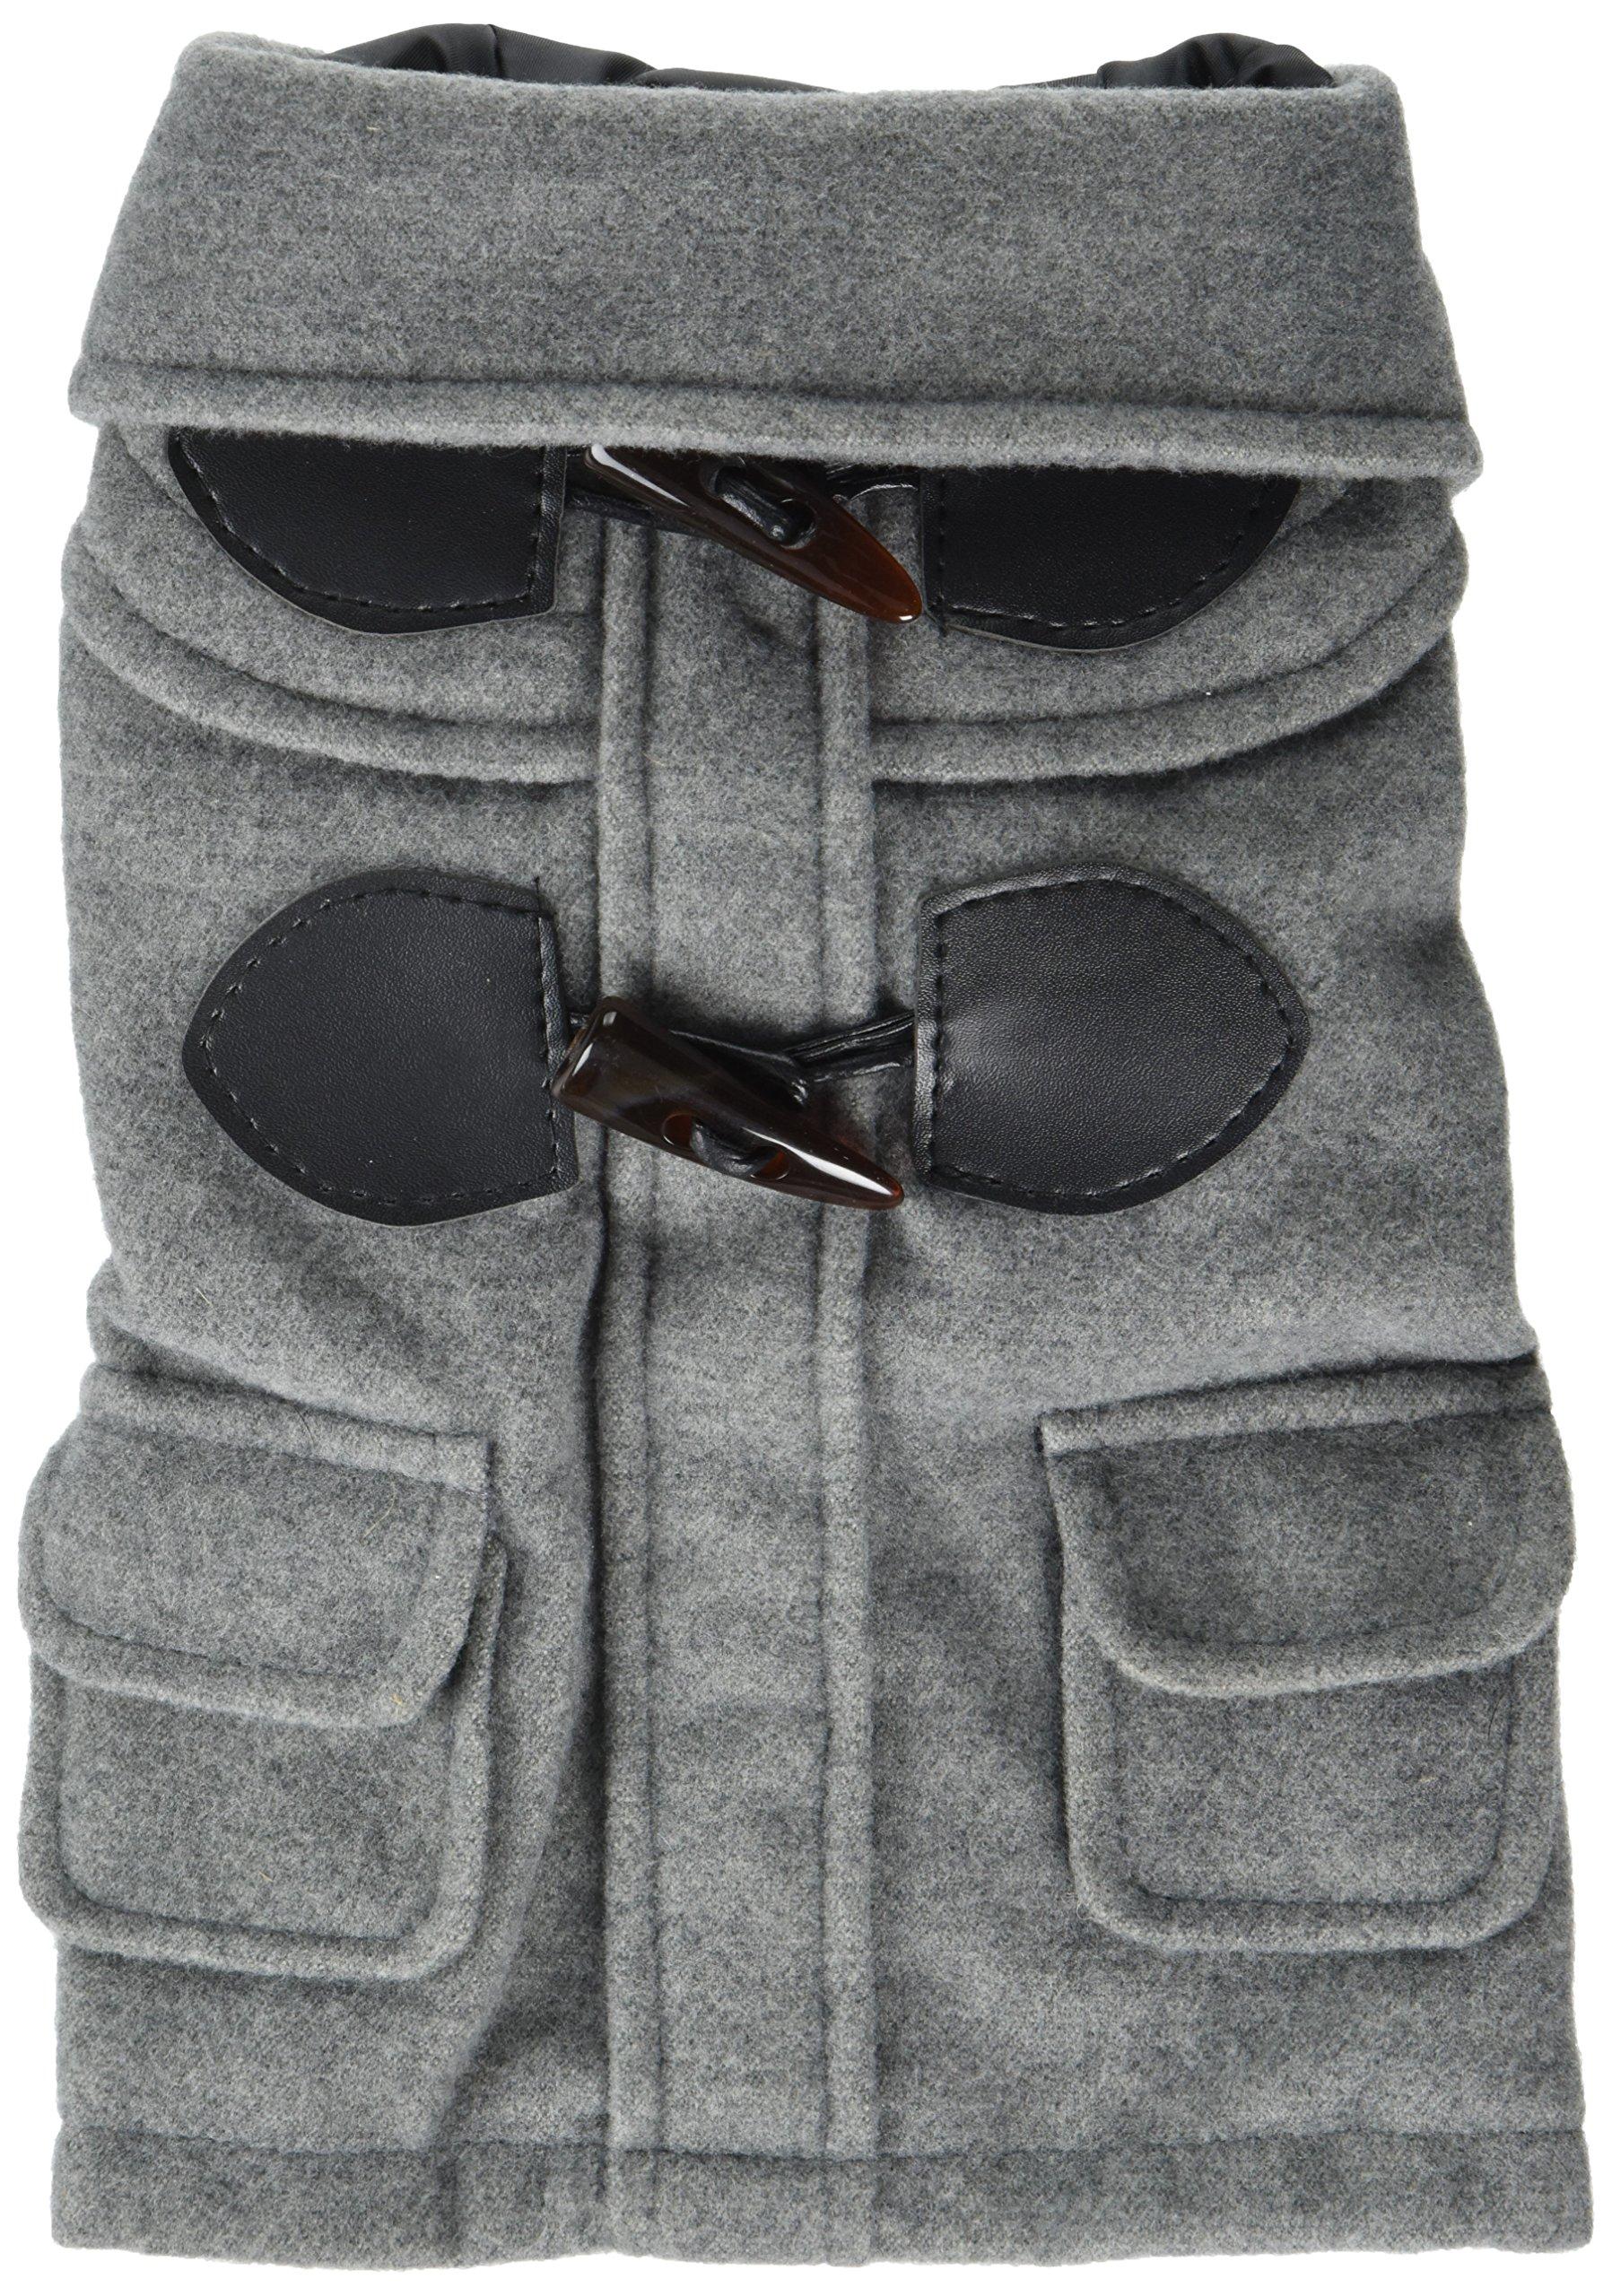 XING YU Pet British Style Horn Button Woolen Overcoat, Grey, Medium